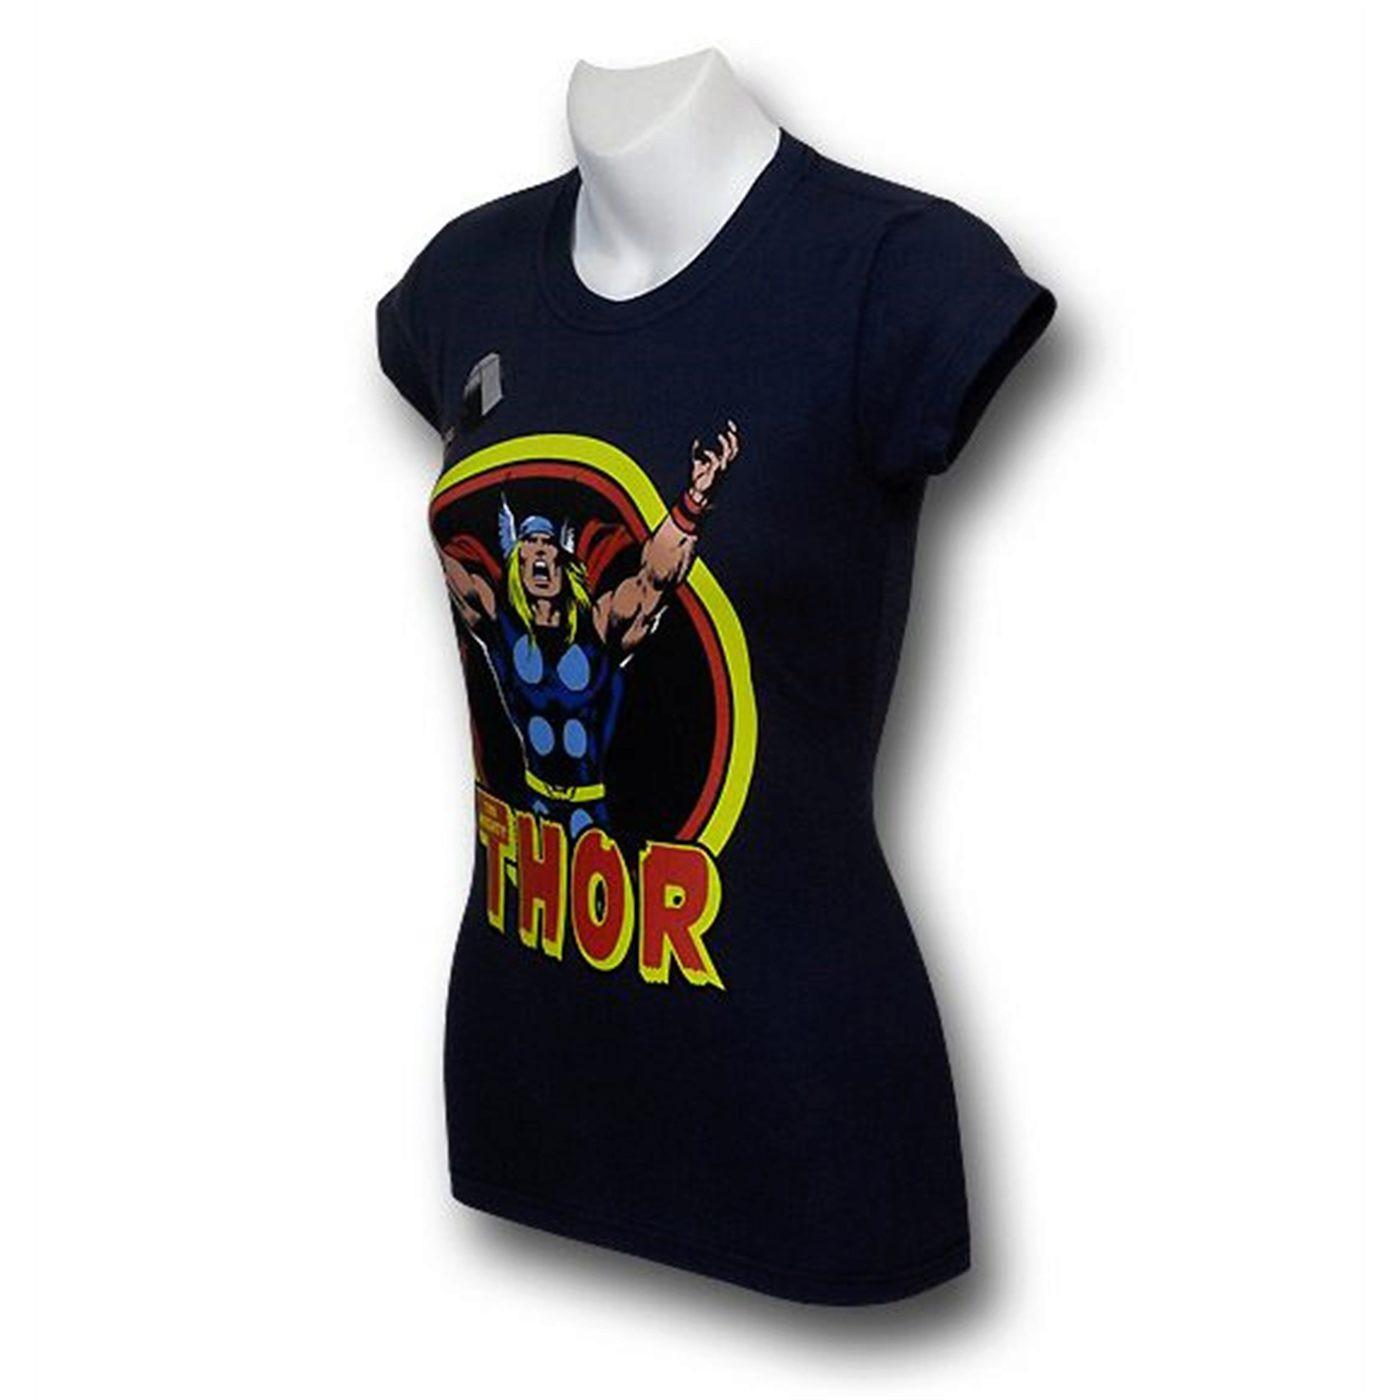 Thor Arms Raised Women's T-Shirt